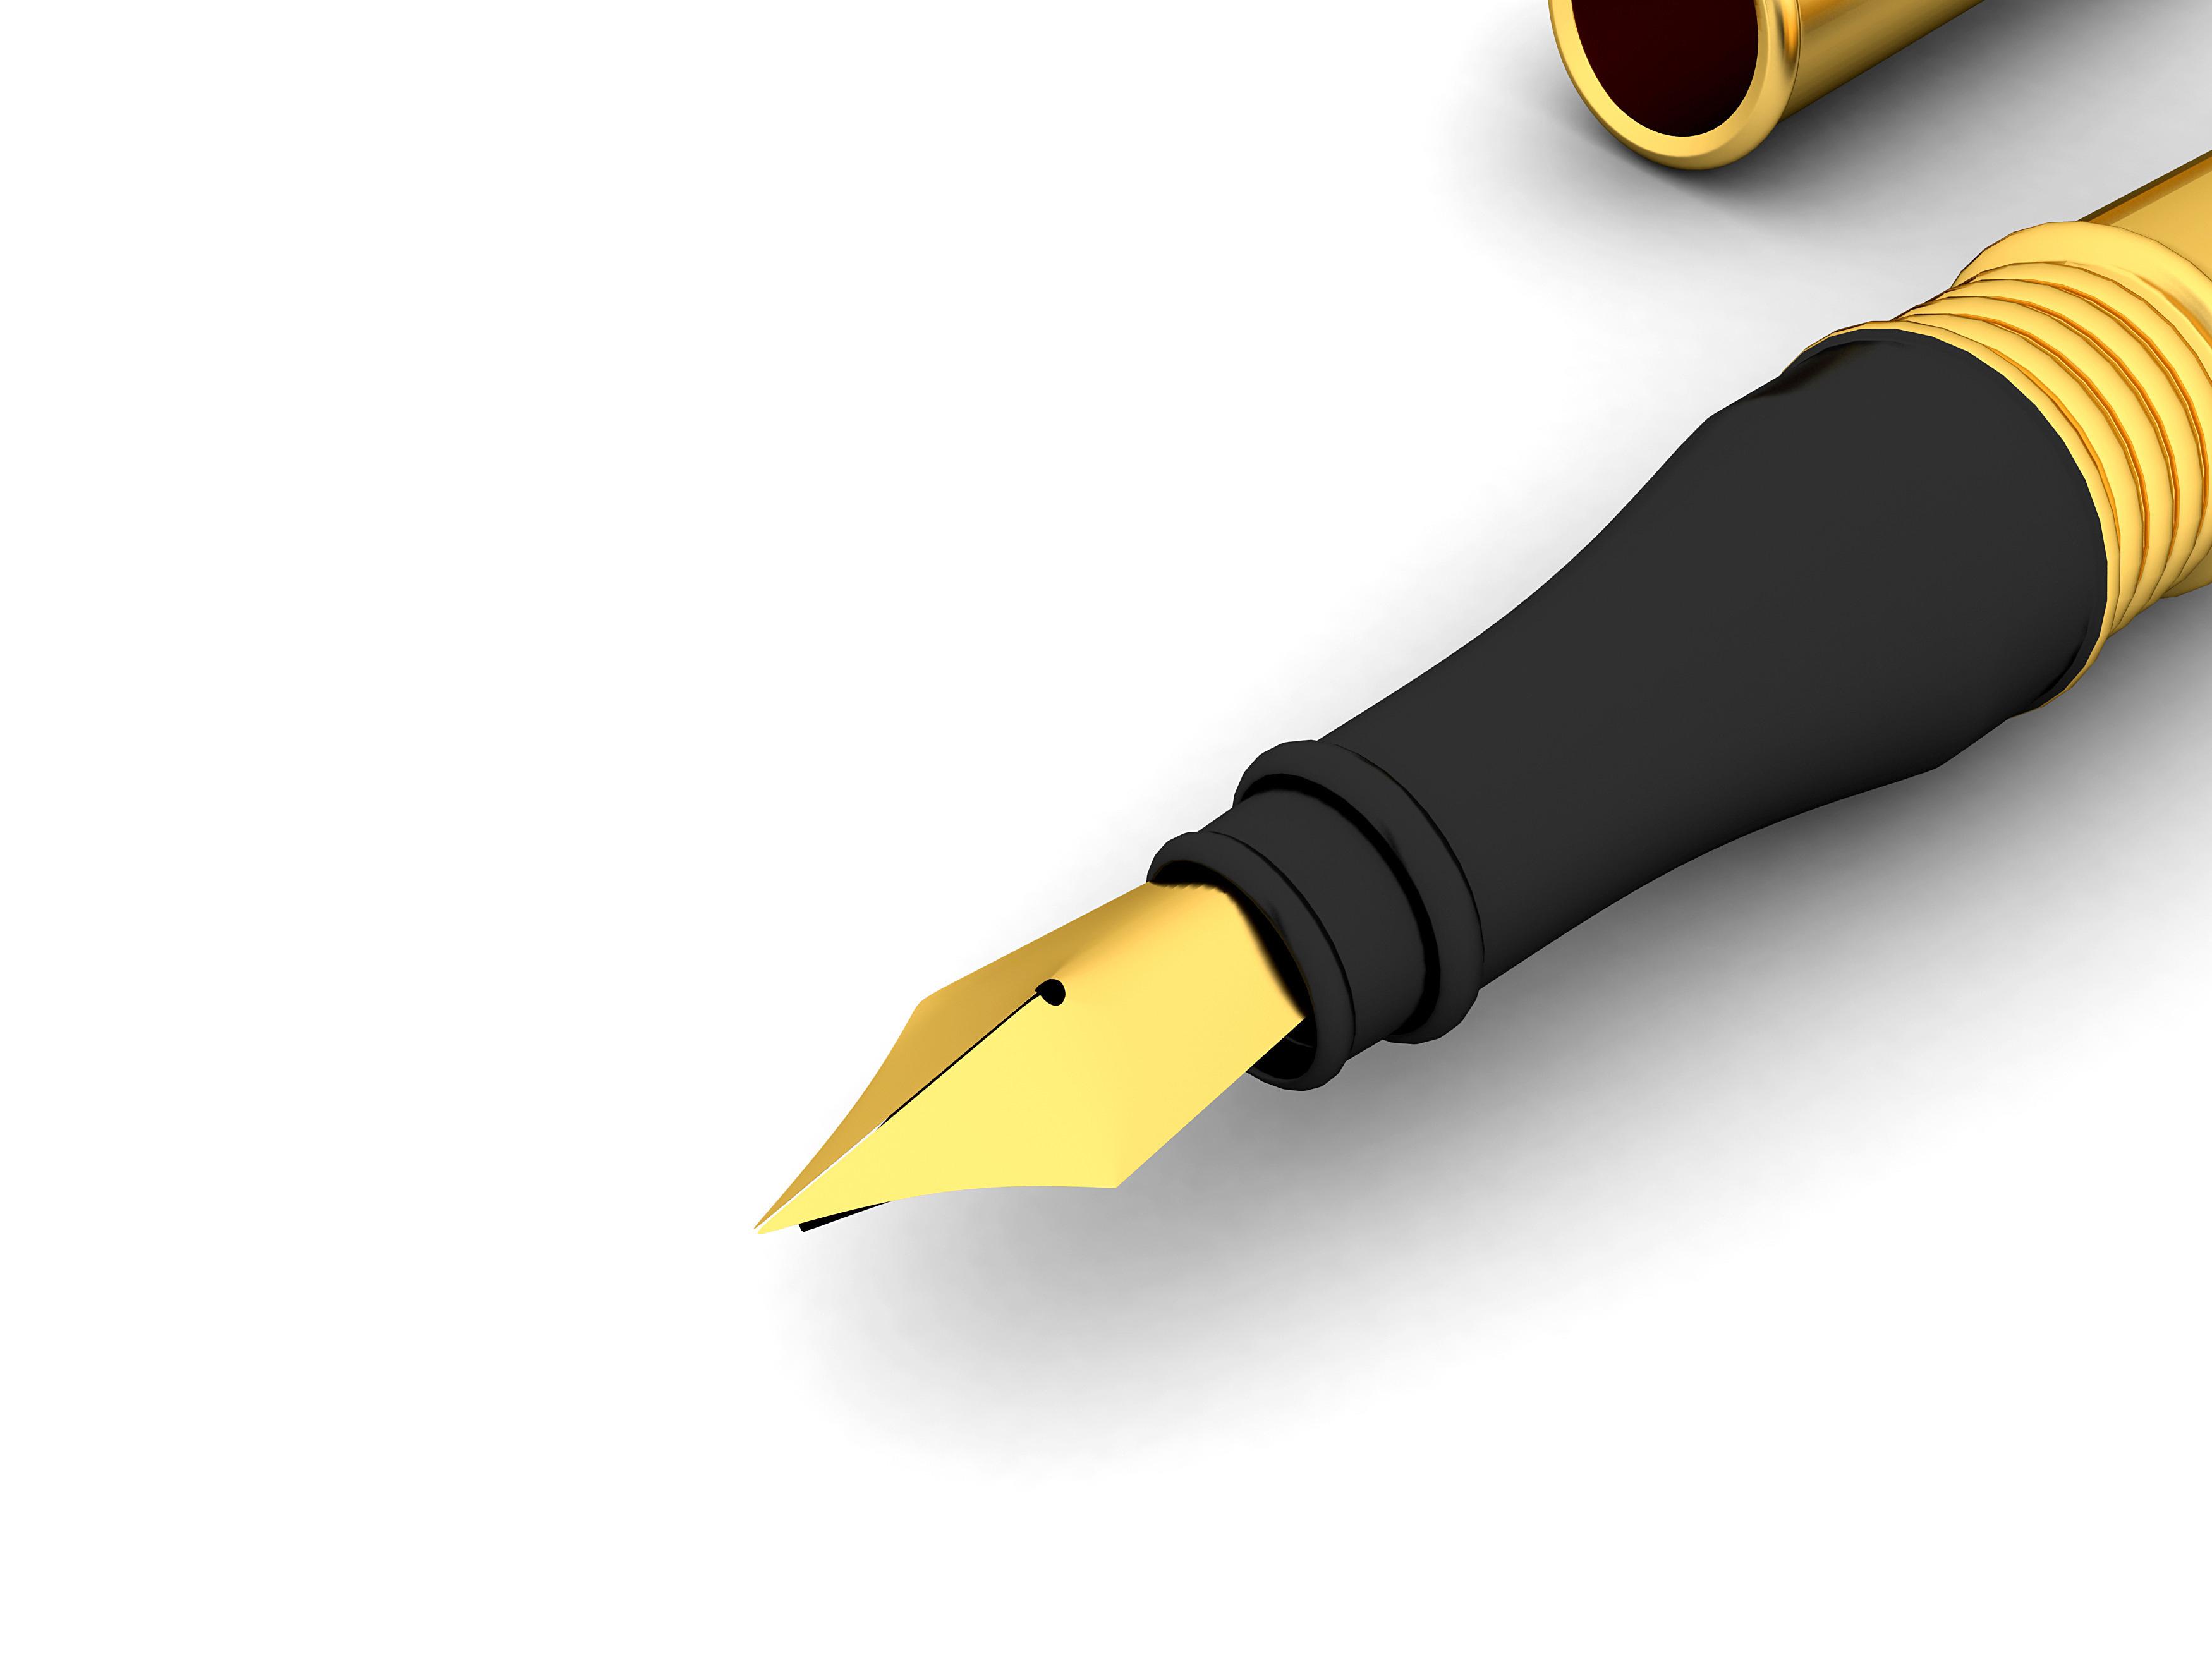 Gold Fountain Pen Mjs 08Uu